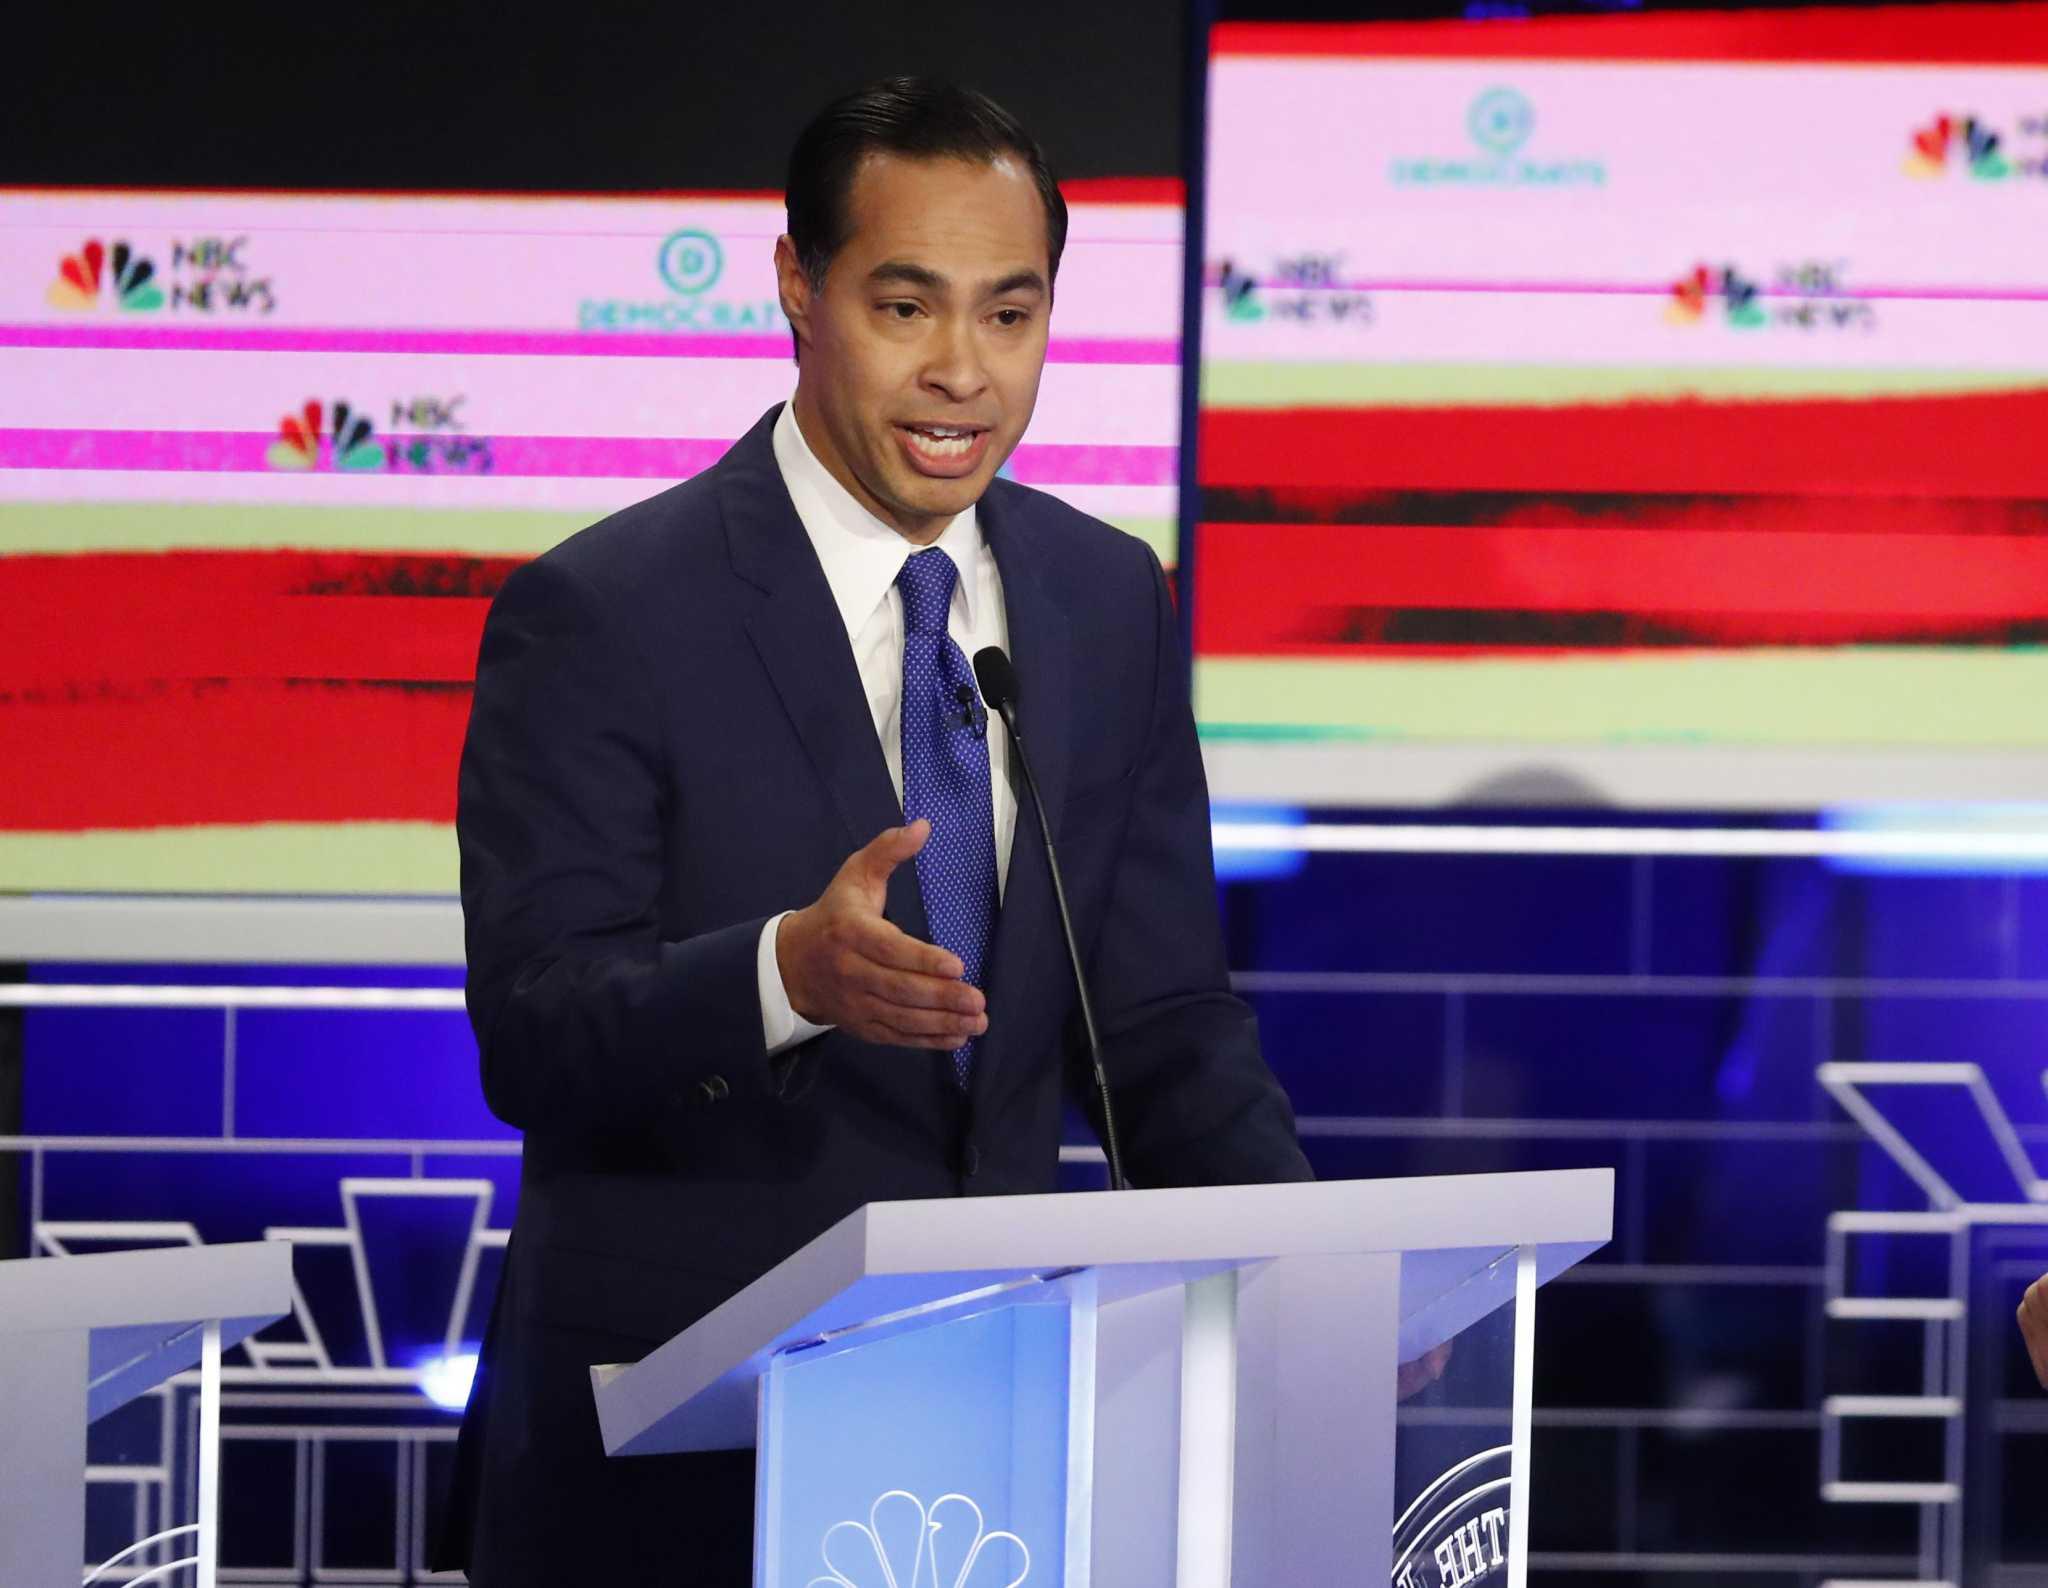 Julián Castro on stage with Joe Biden in next Democratic debates